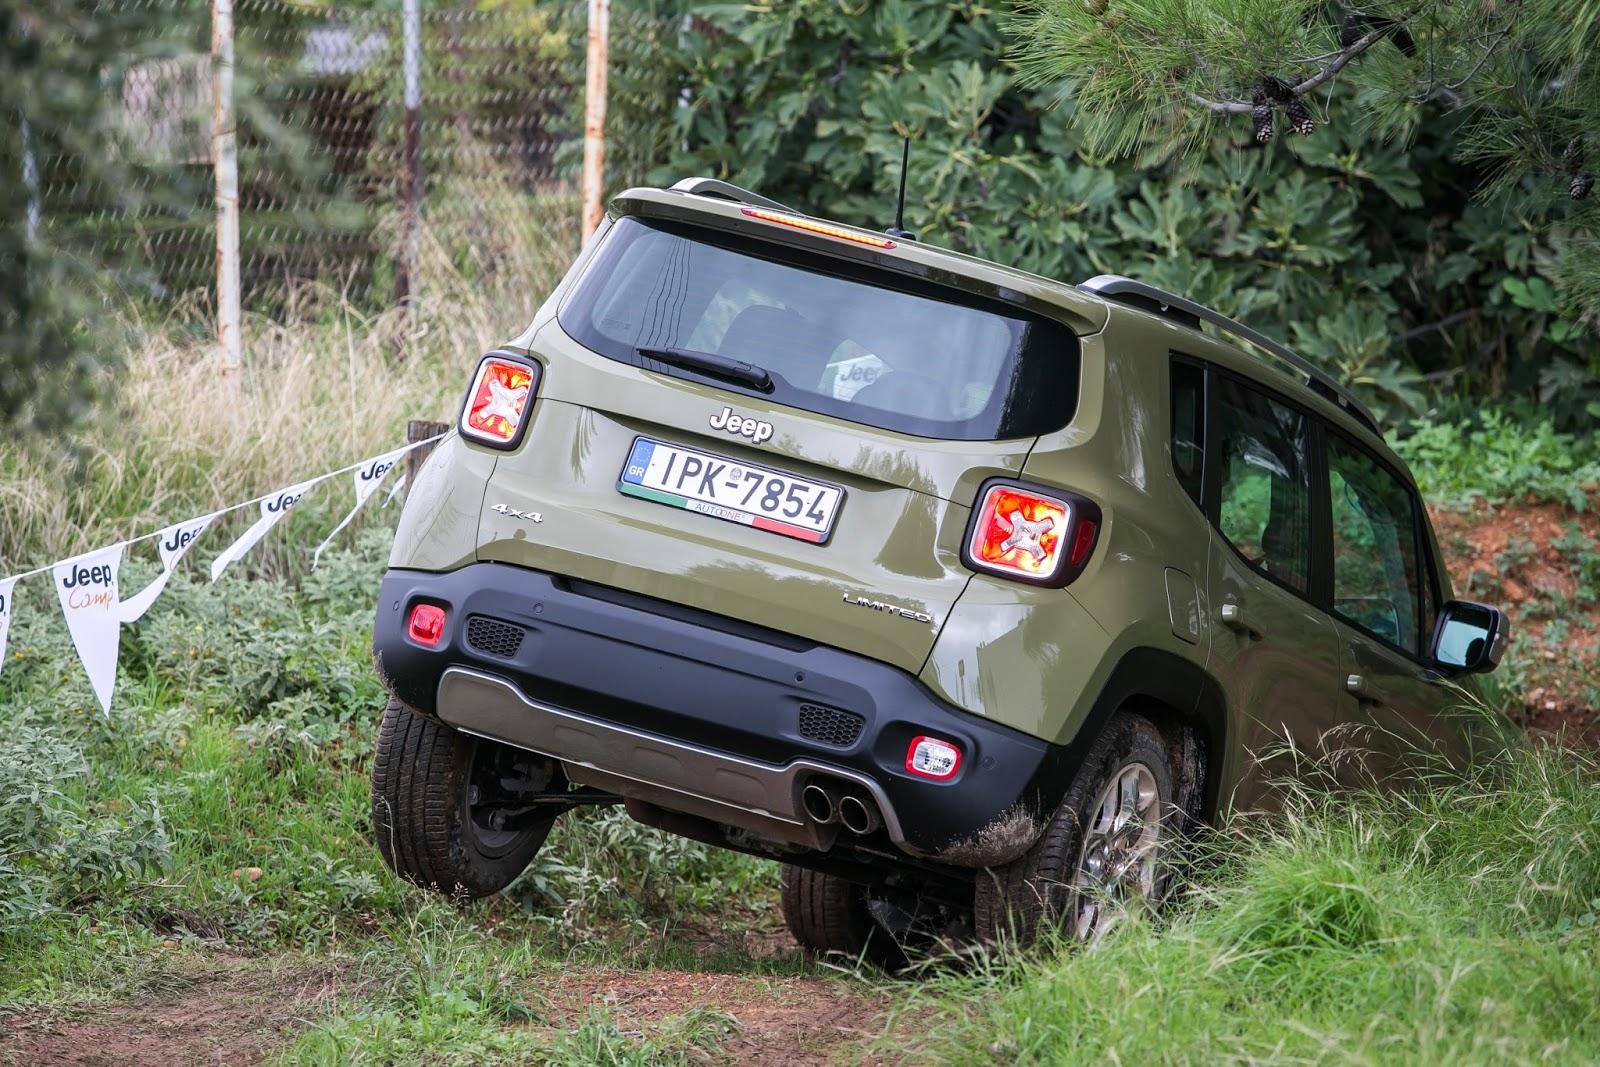 KF 1513 Πετάμε ένα Jeep Renegade σε λάσπες, πέτρες, άμμο, λίμνες. Θα τα καταφέρει;